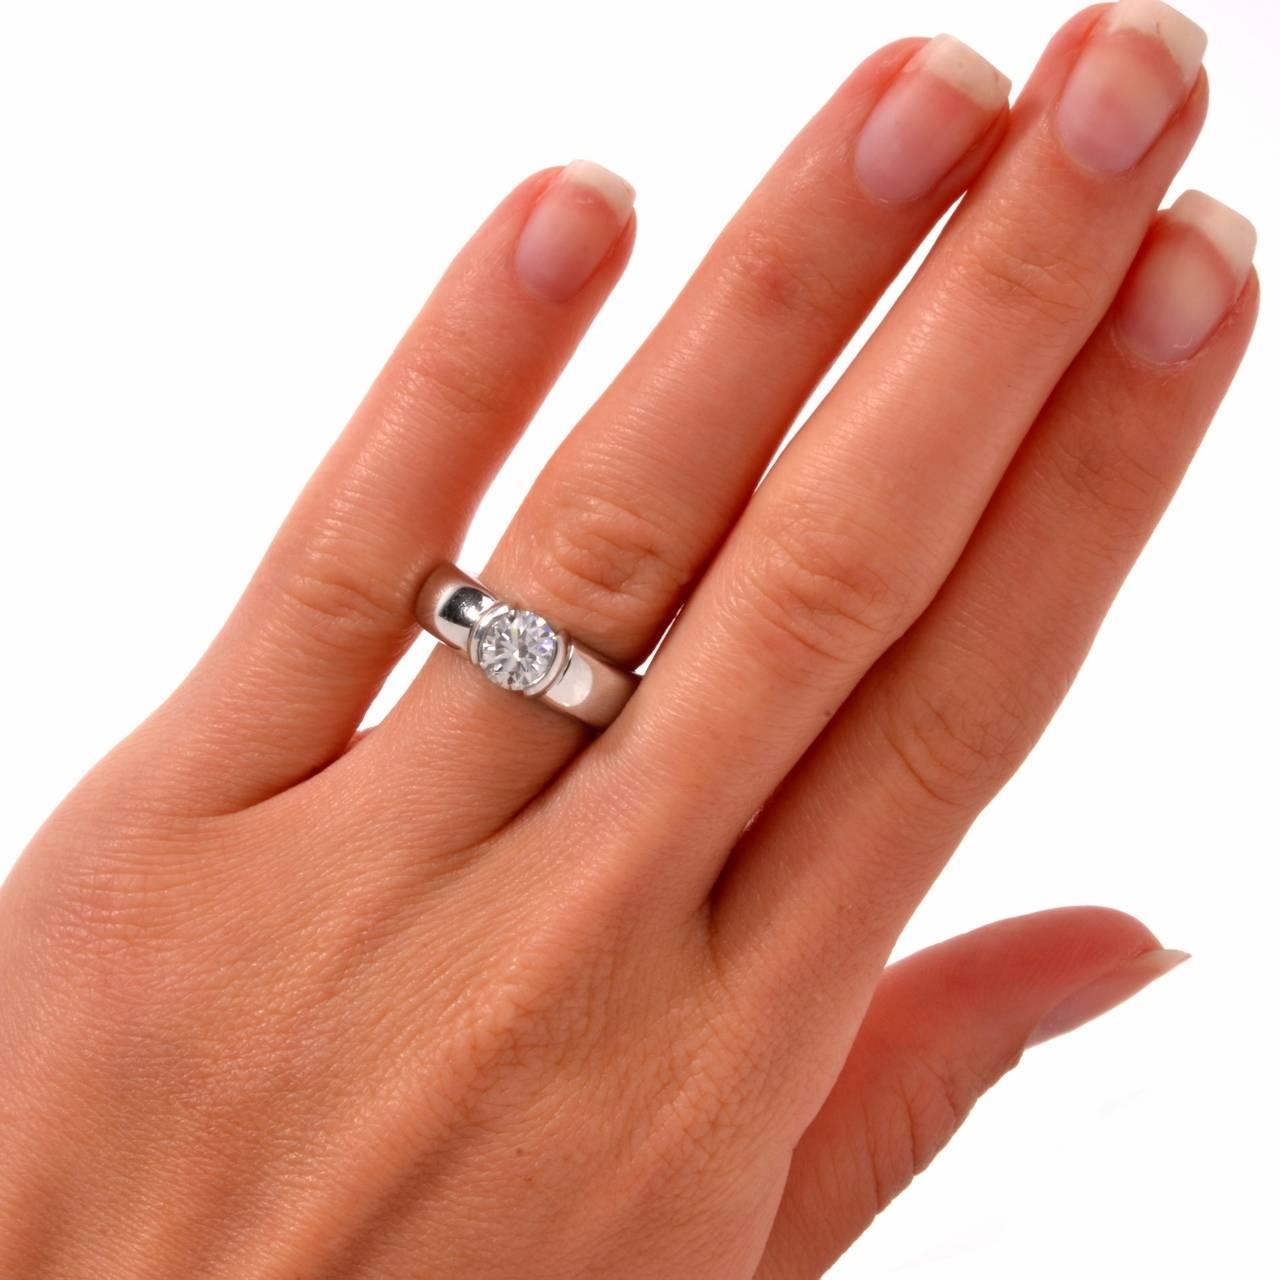 Tiffany and Co. Etoile Diamond Platinum Engagement Ring at 1stdibs | 1280 x 1280 jpeg 103kB